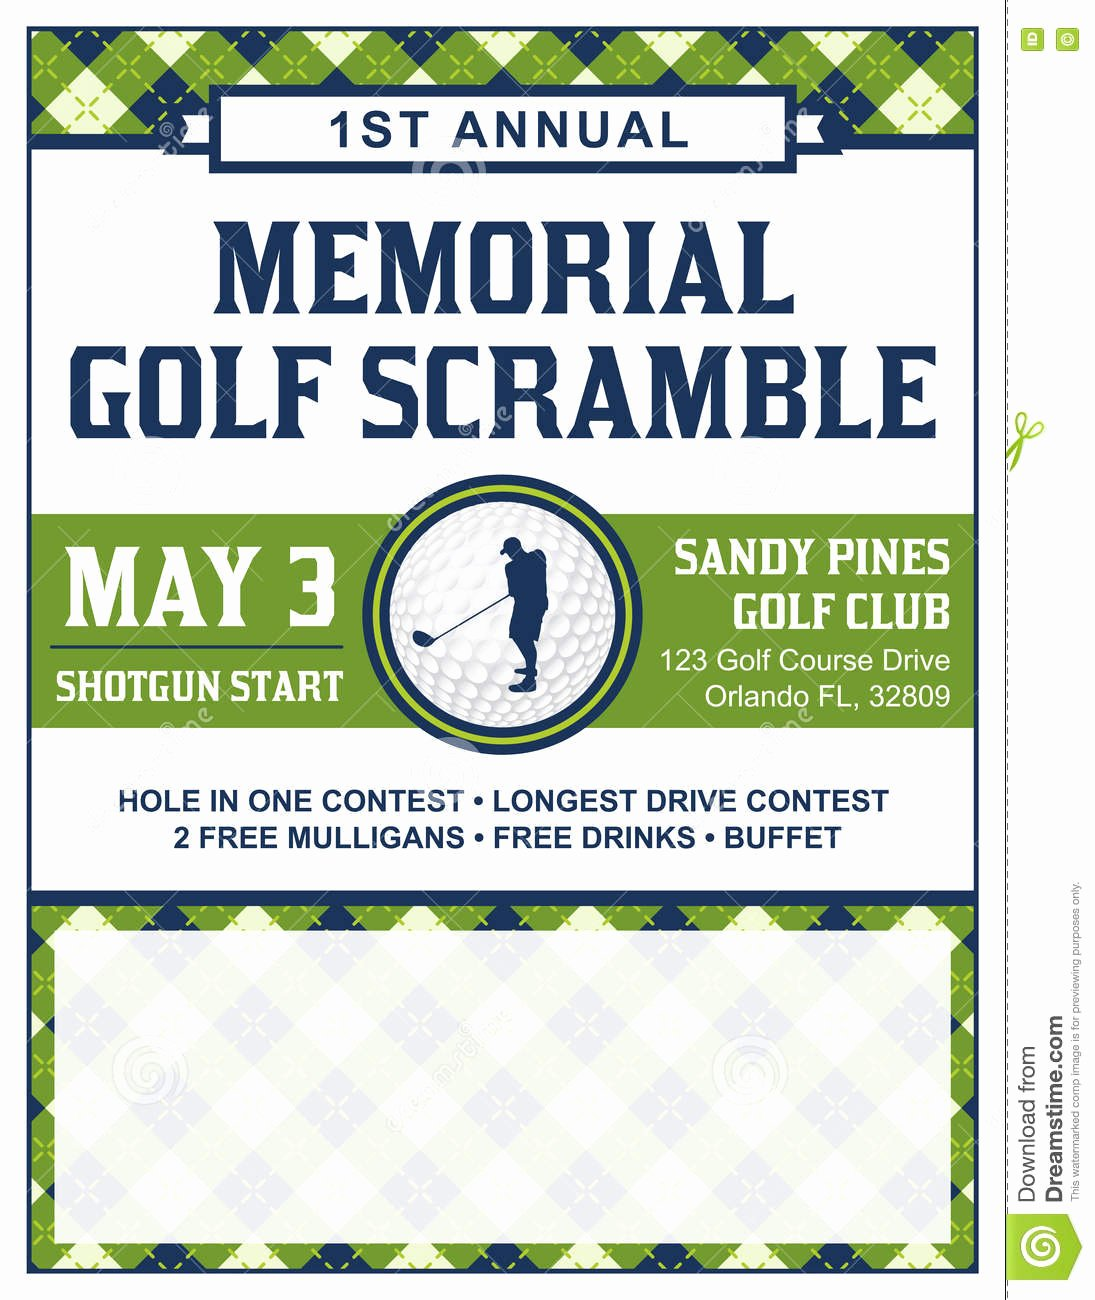 Free Golf Flyer Templates New Golf tournament Flyer Template Stock Vector Illustration Of Golfing Scramble